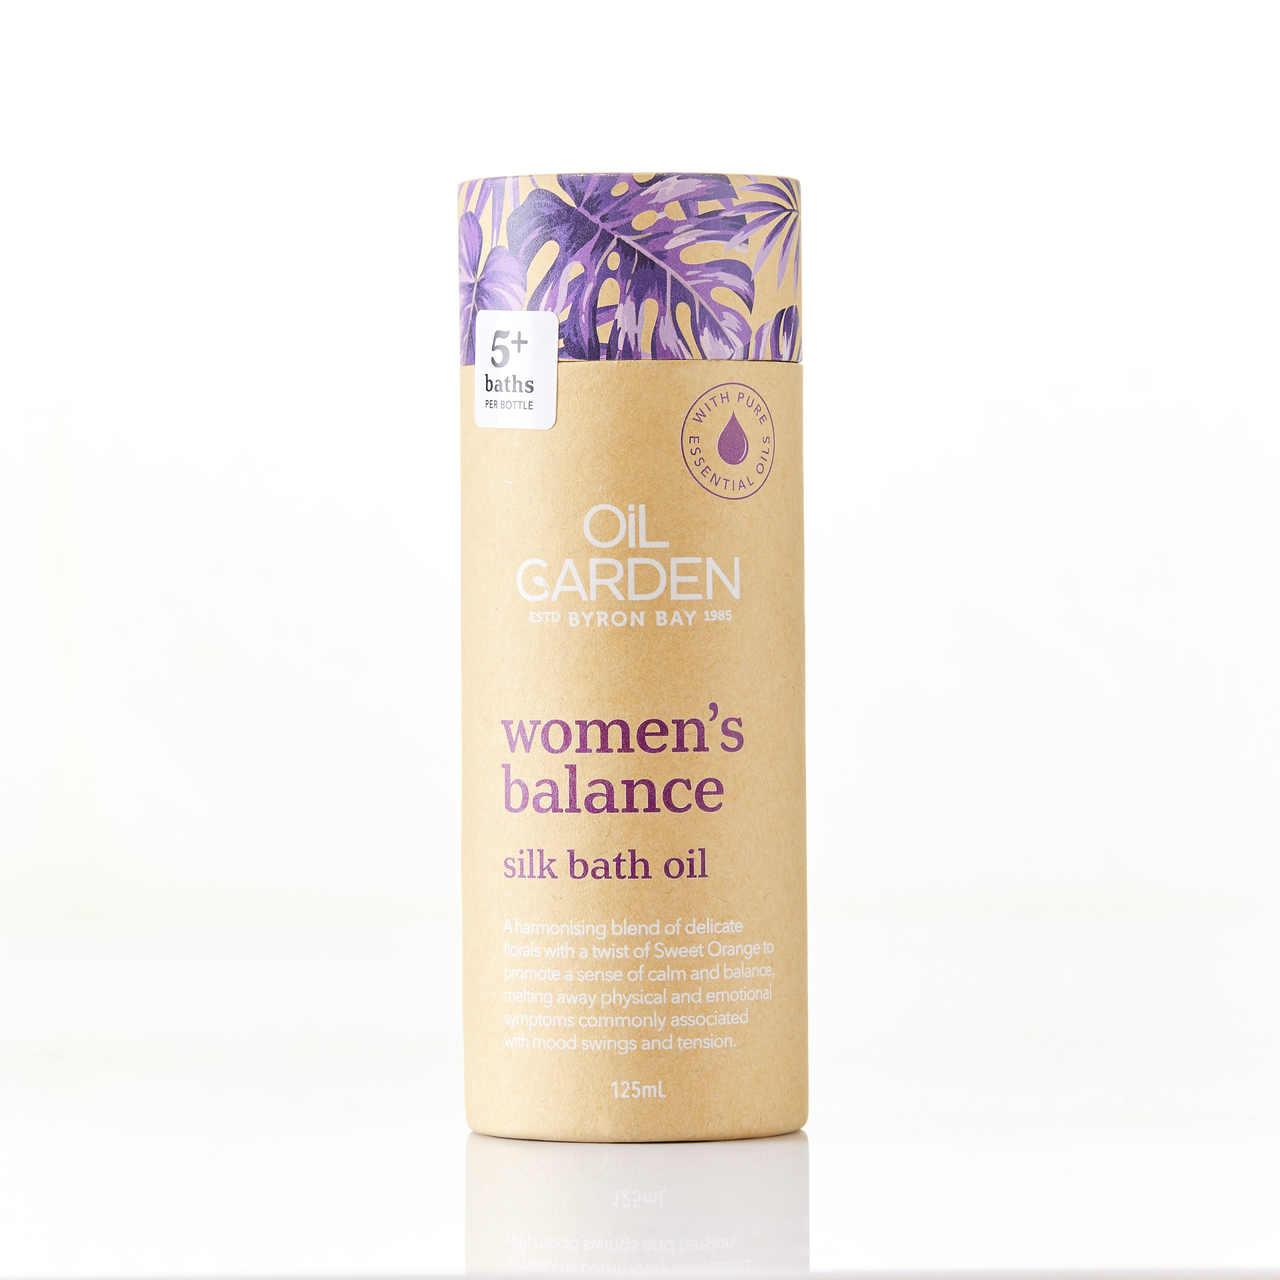 Oil Garden Women's Balance Silk Bath Oil 125mL 6670114